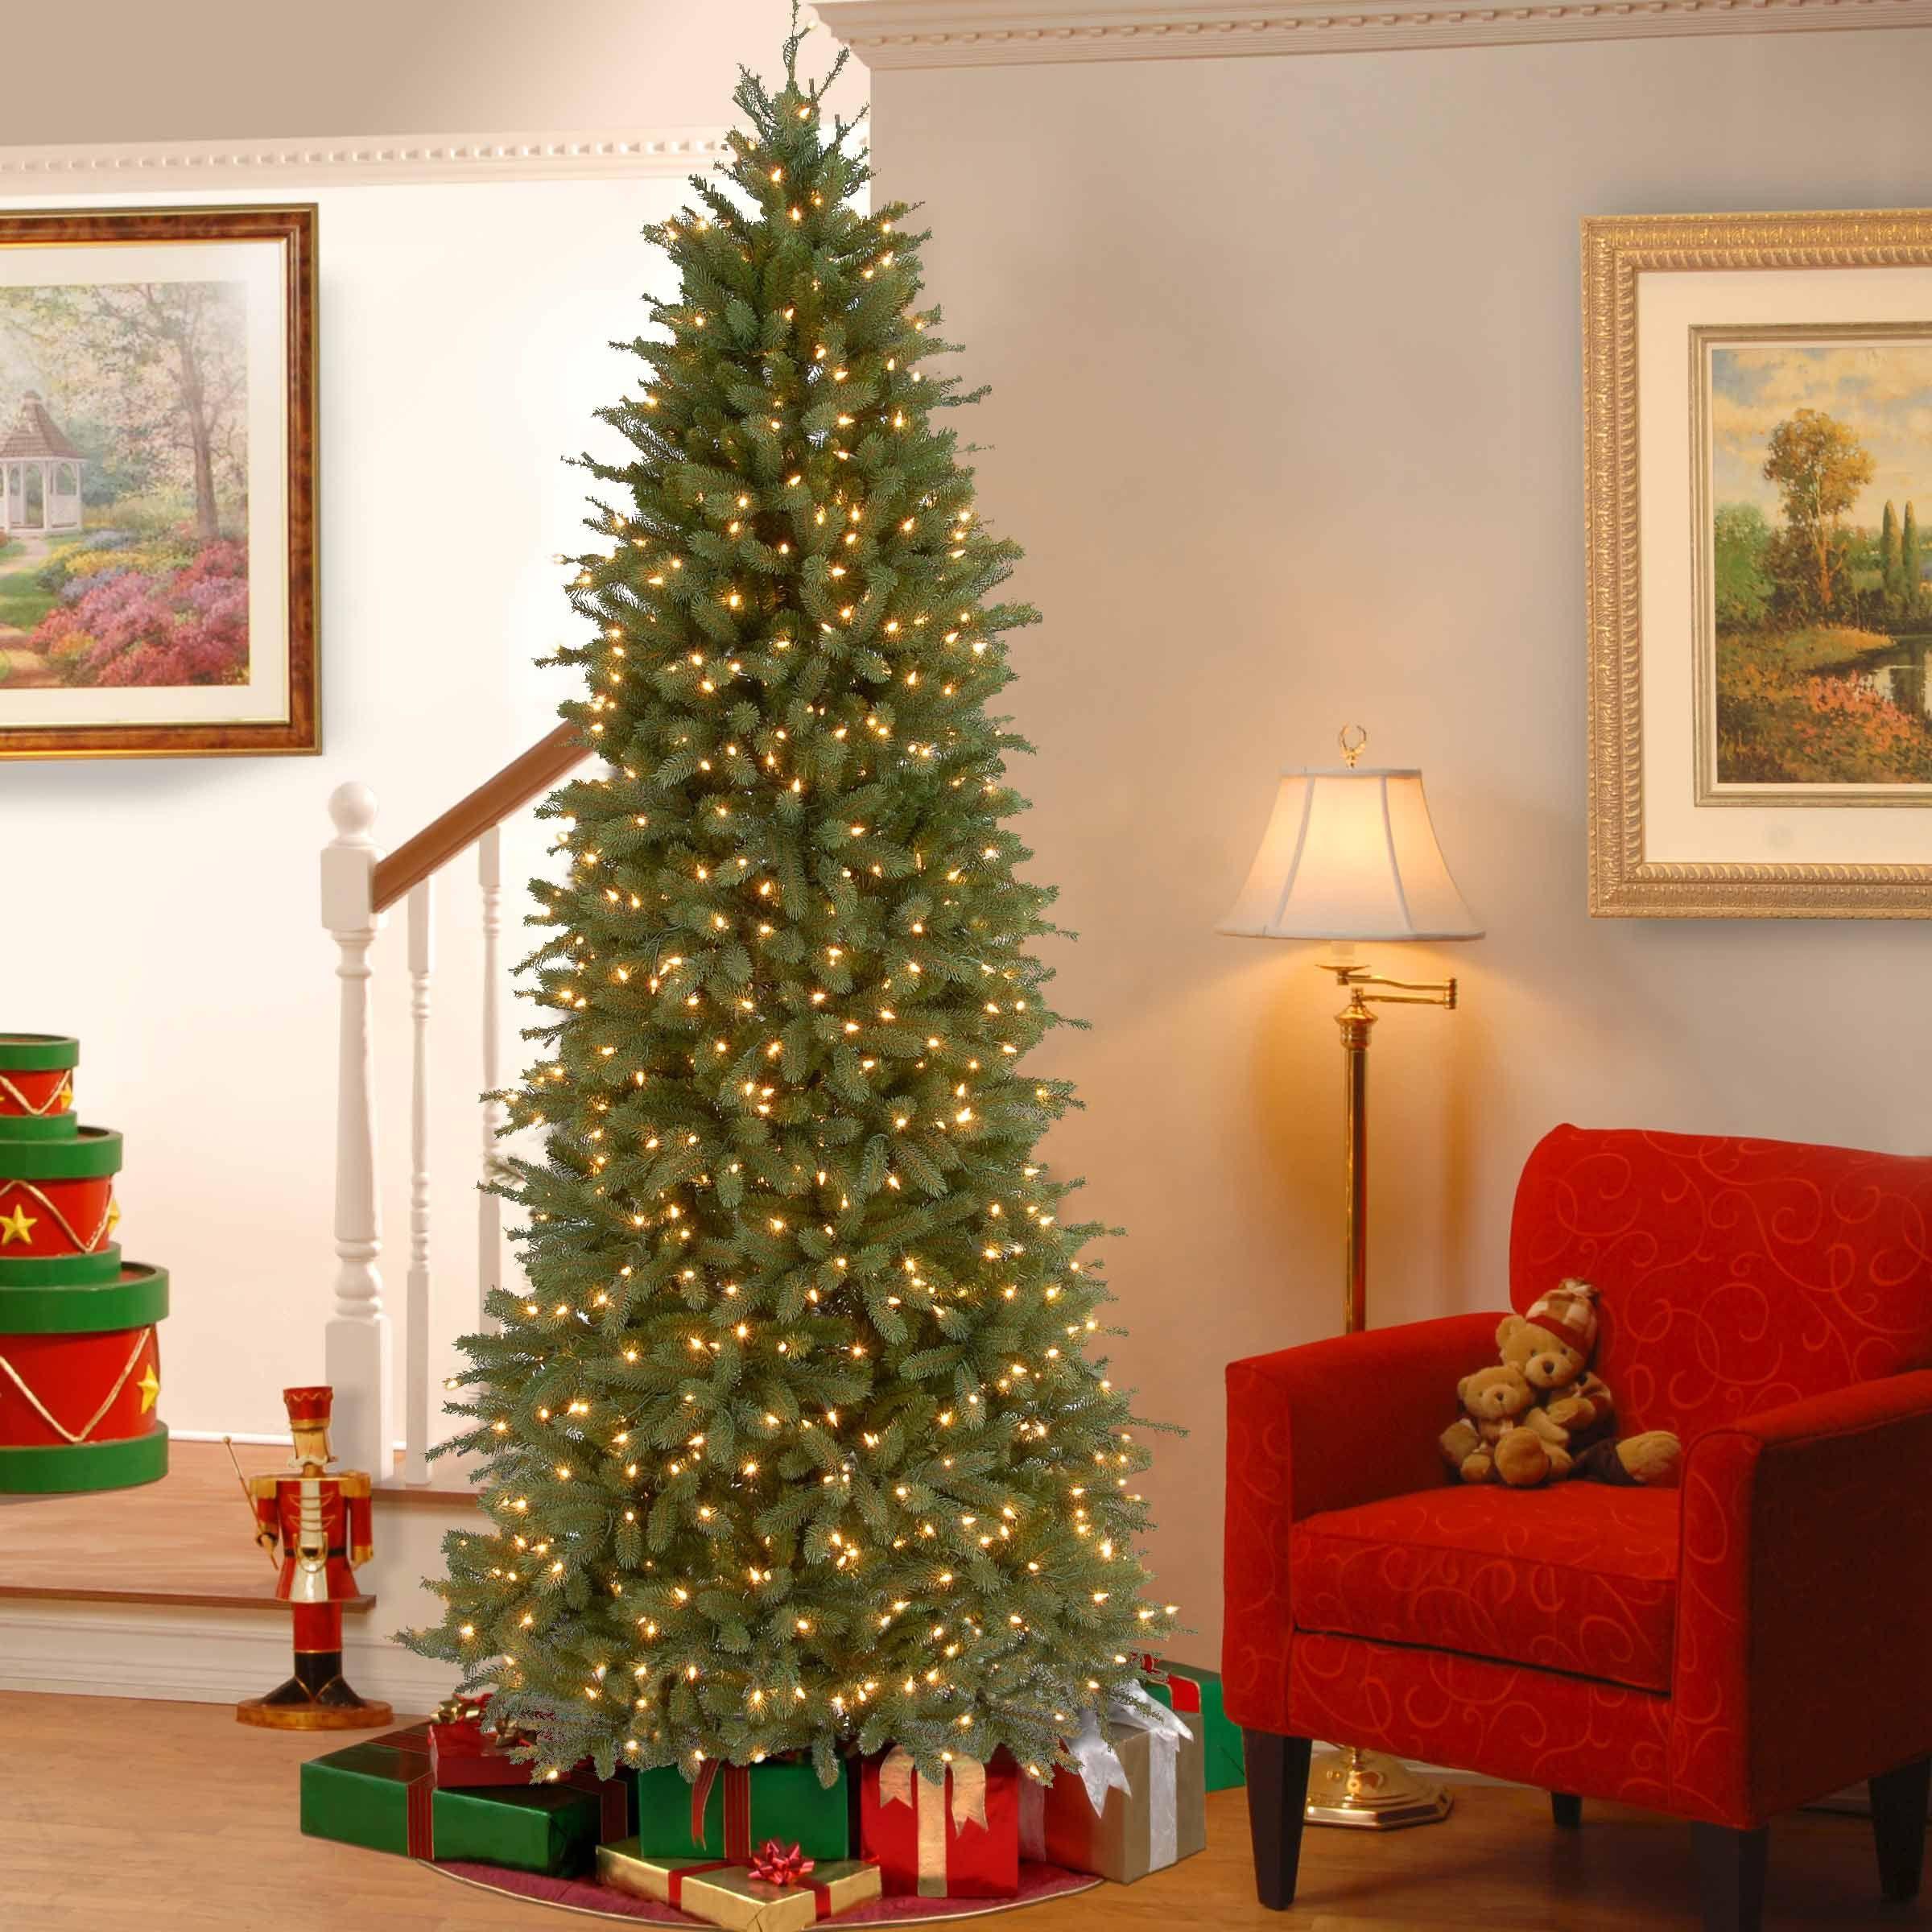 Tom 7 5ft Fir Slim Christmas Tree Real Feel Pre Lit With 650 Clear Lights Slim Christmas Tree White Christmas Trees Green Christmas Tree